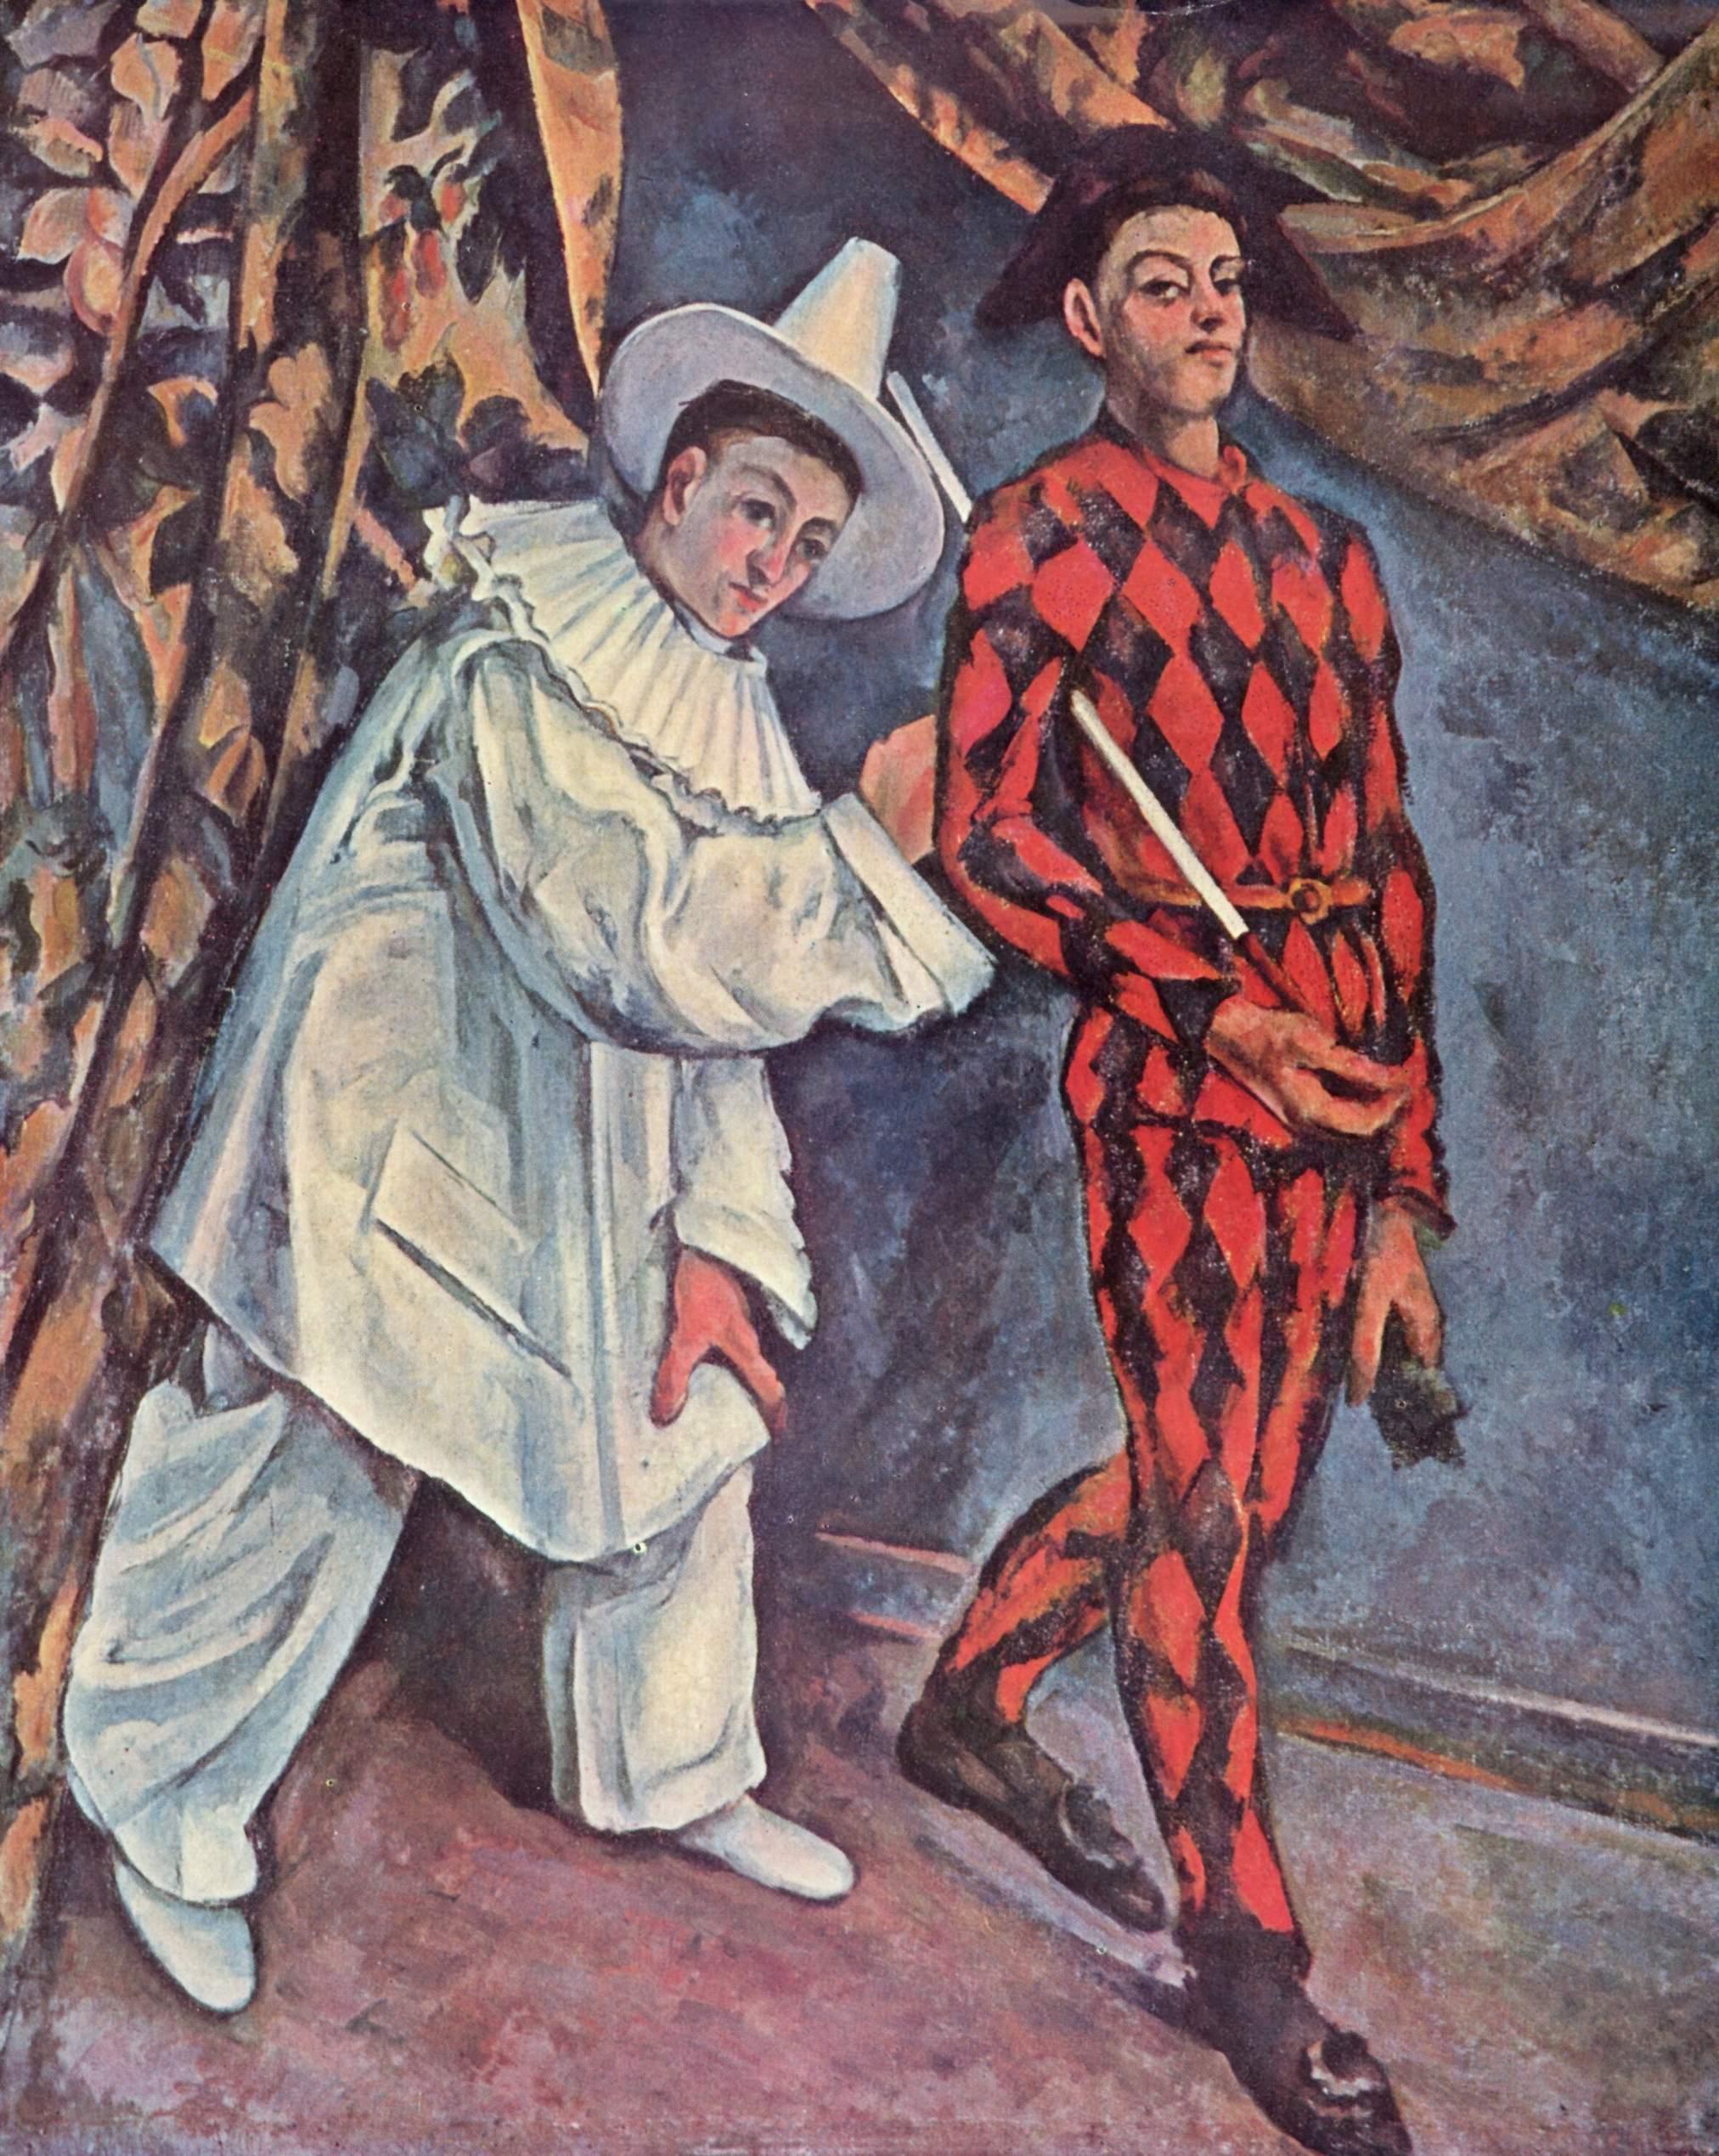 Pierrot and Harlequin (Mardi Gras), 1888 - Paul Cezanne - WikiArt.org